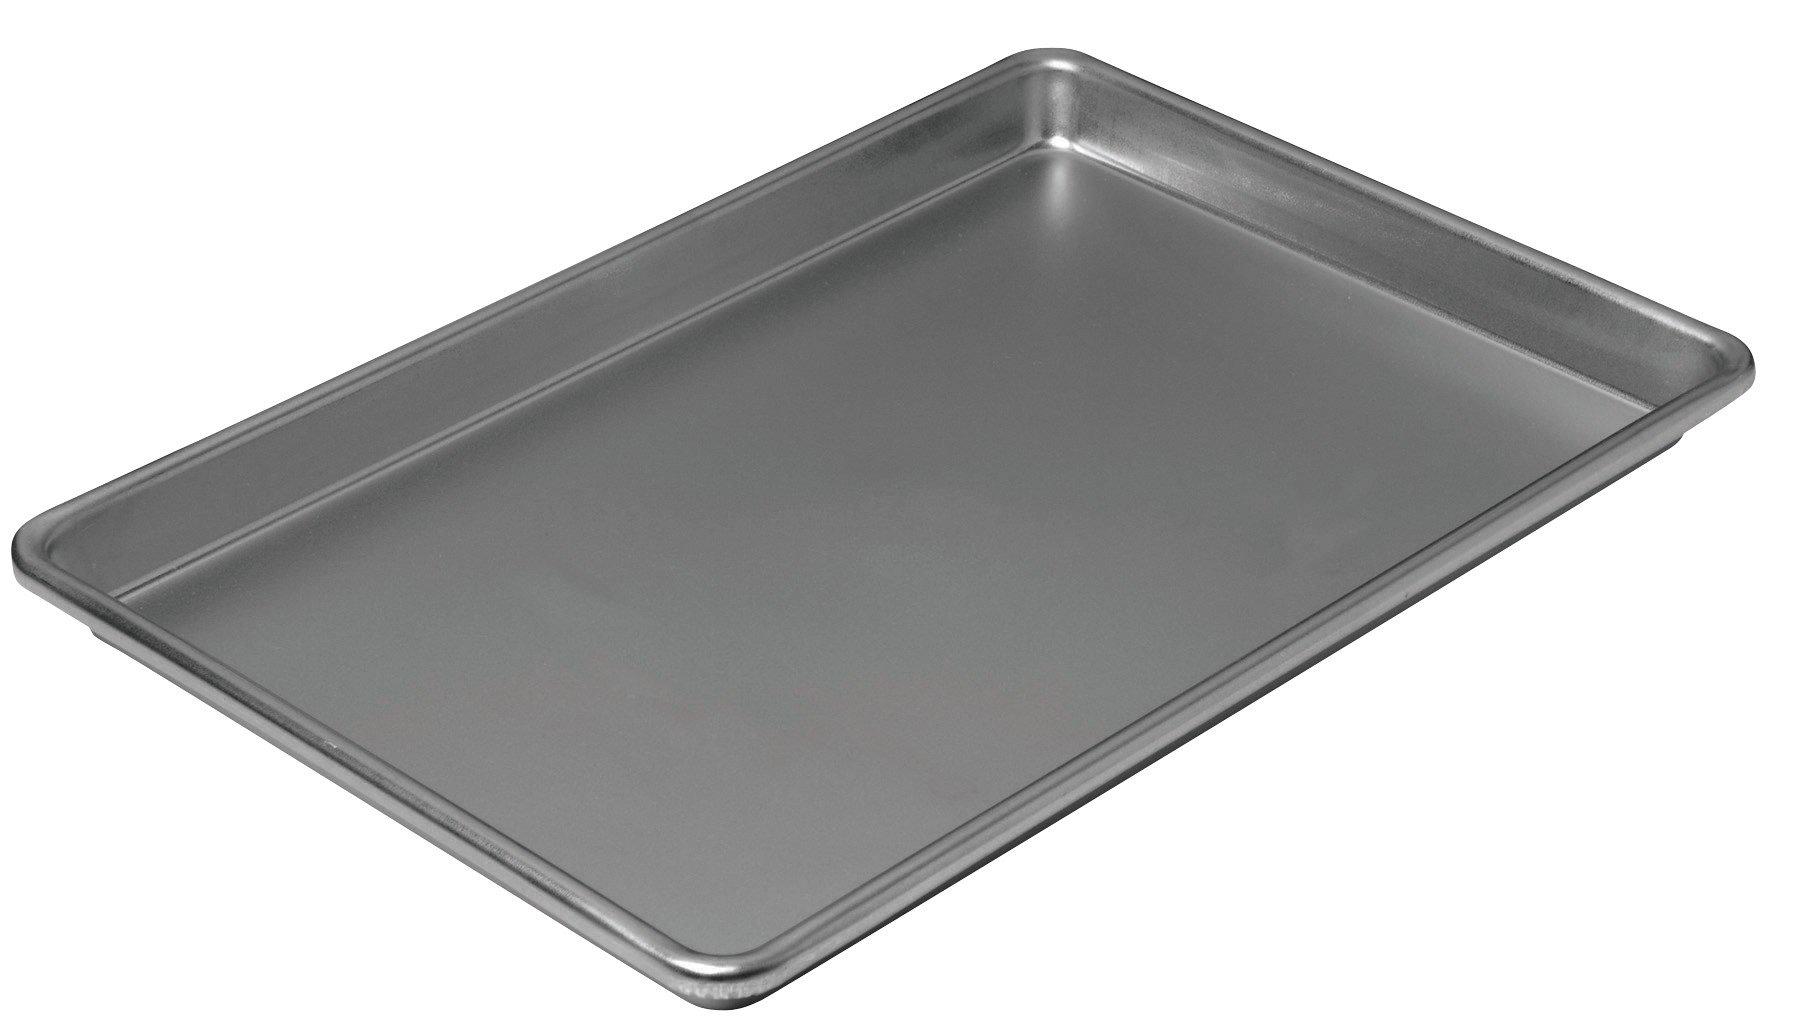 Chicago Metallic 16150 15'' X 10'' Chicago Metallic Non Stick Jelly Roll Pan